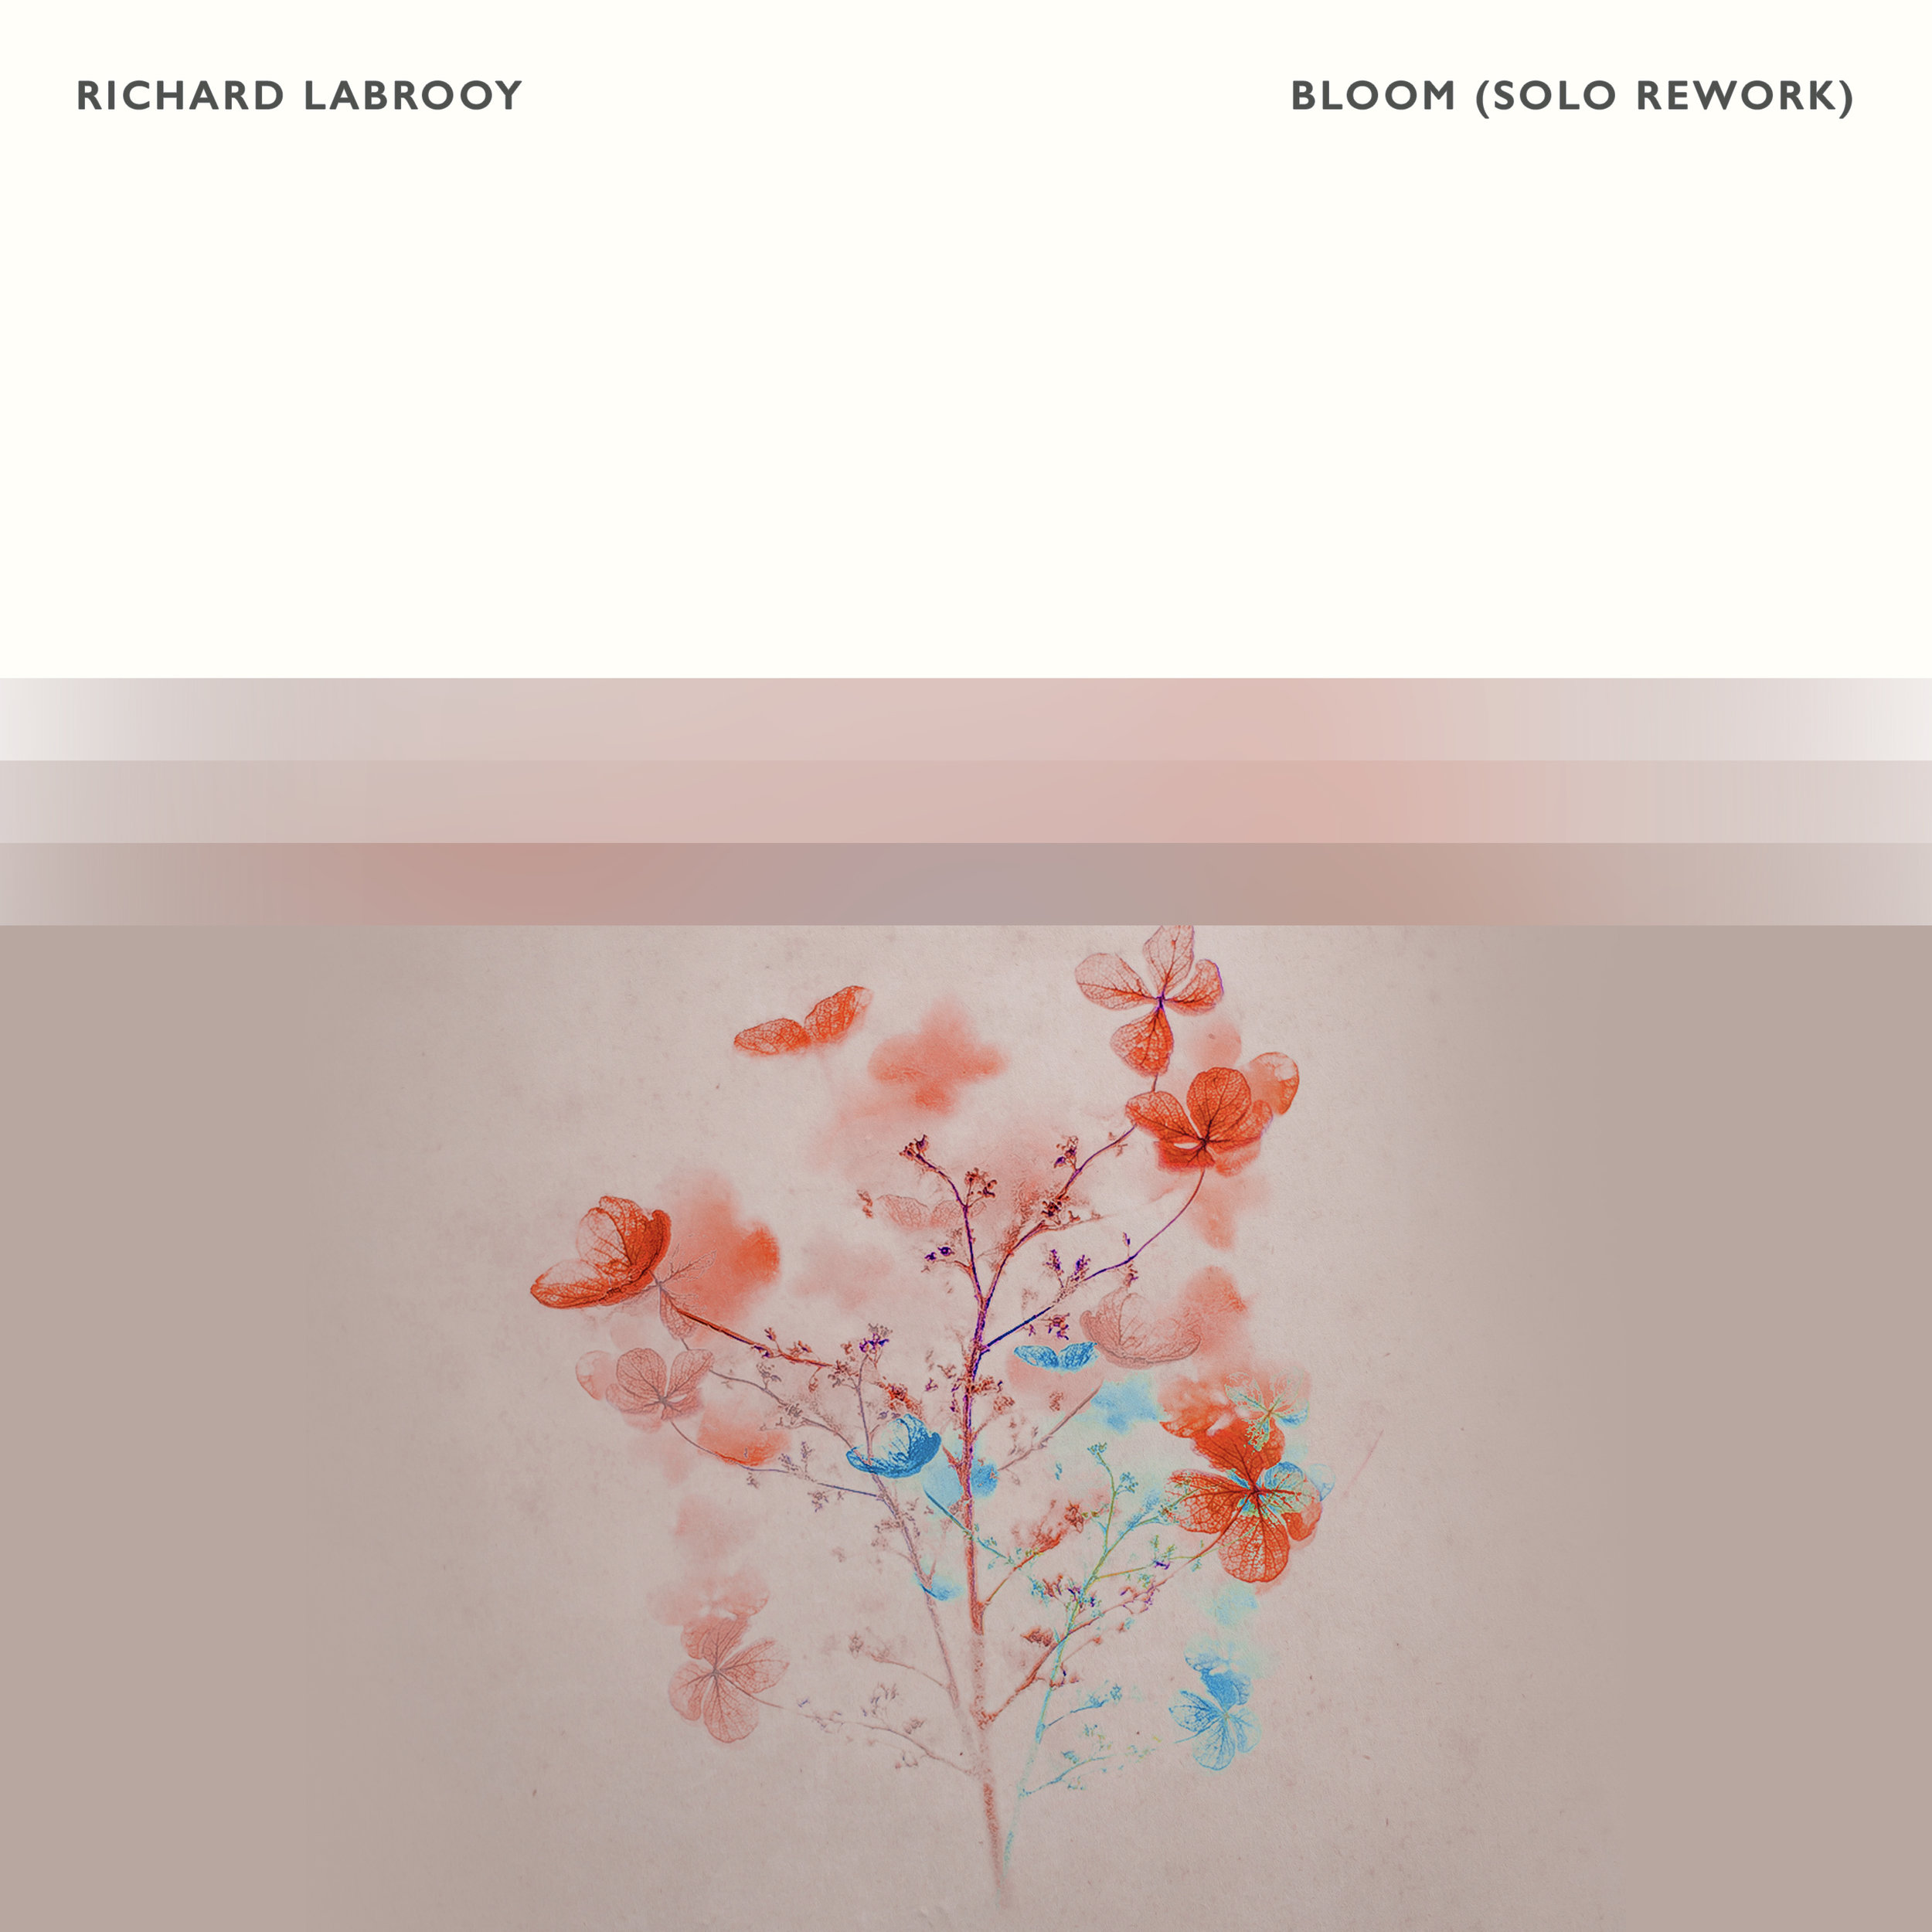 Richard LaBrooy - Bloom (Solo Rework)